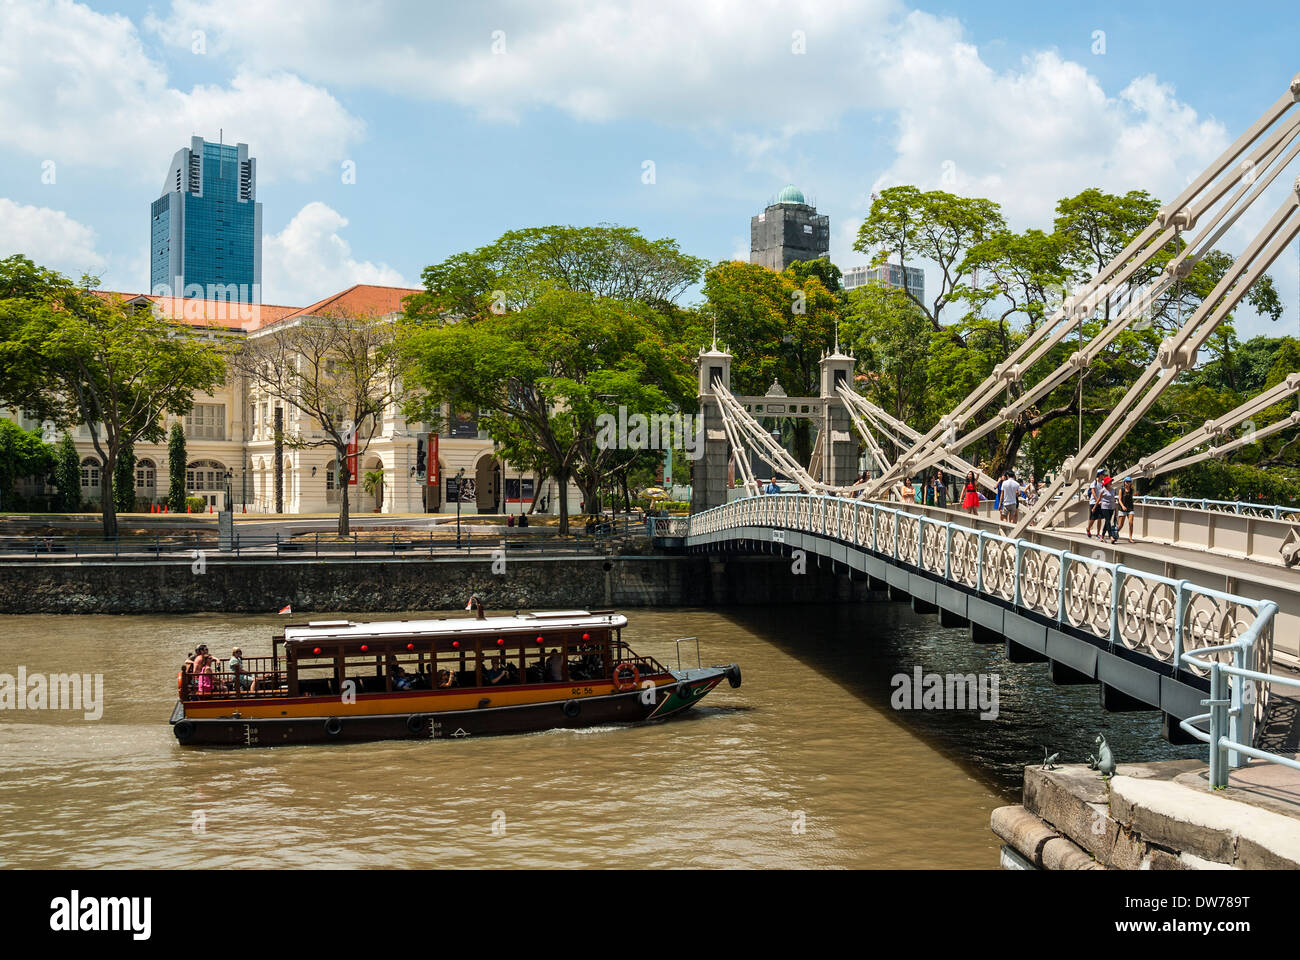 Cavenagh Bridge and Asian Civilisations Museum, Singapore - Stock Image